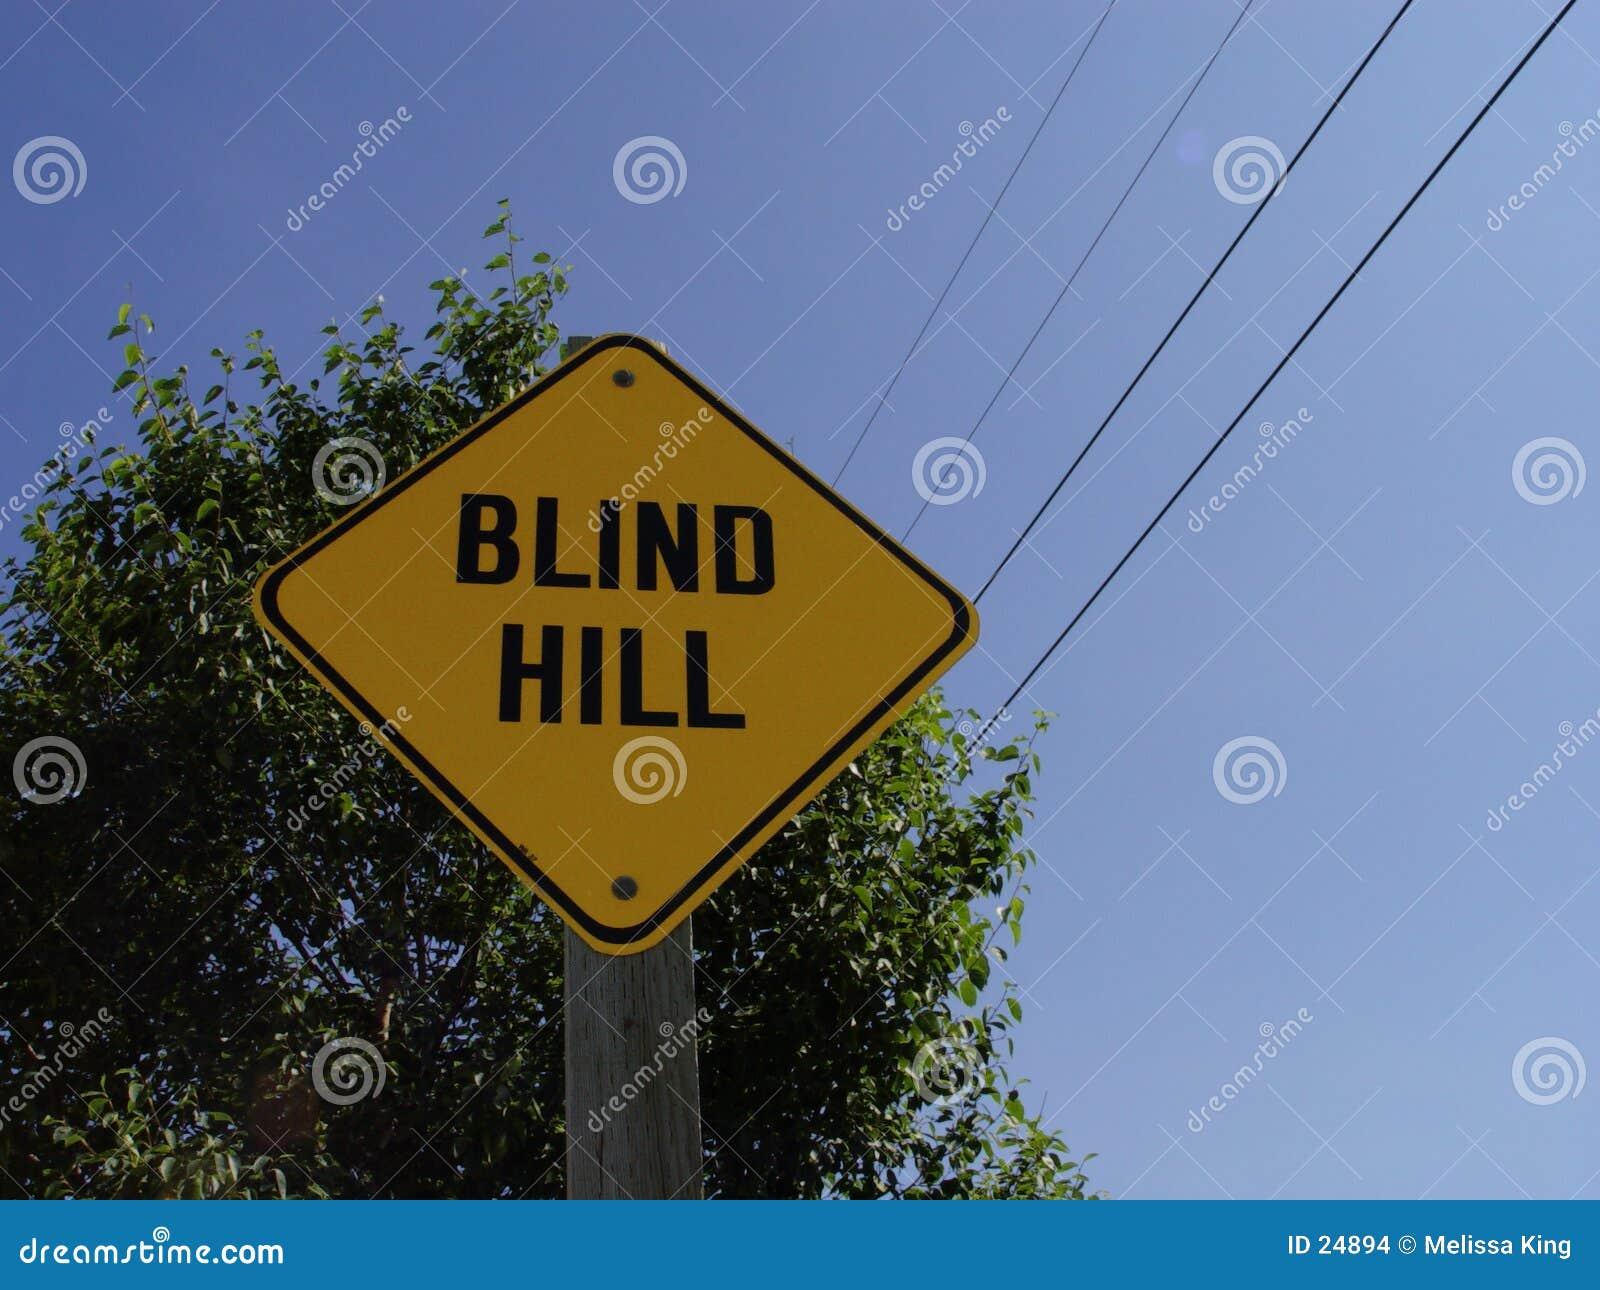 Blind Hill Sign